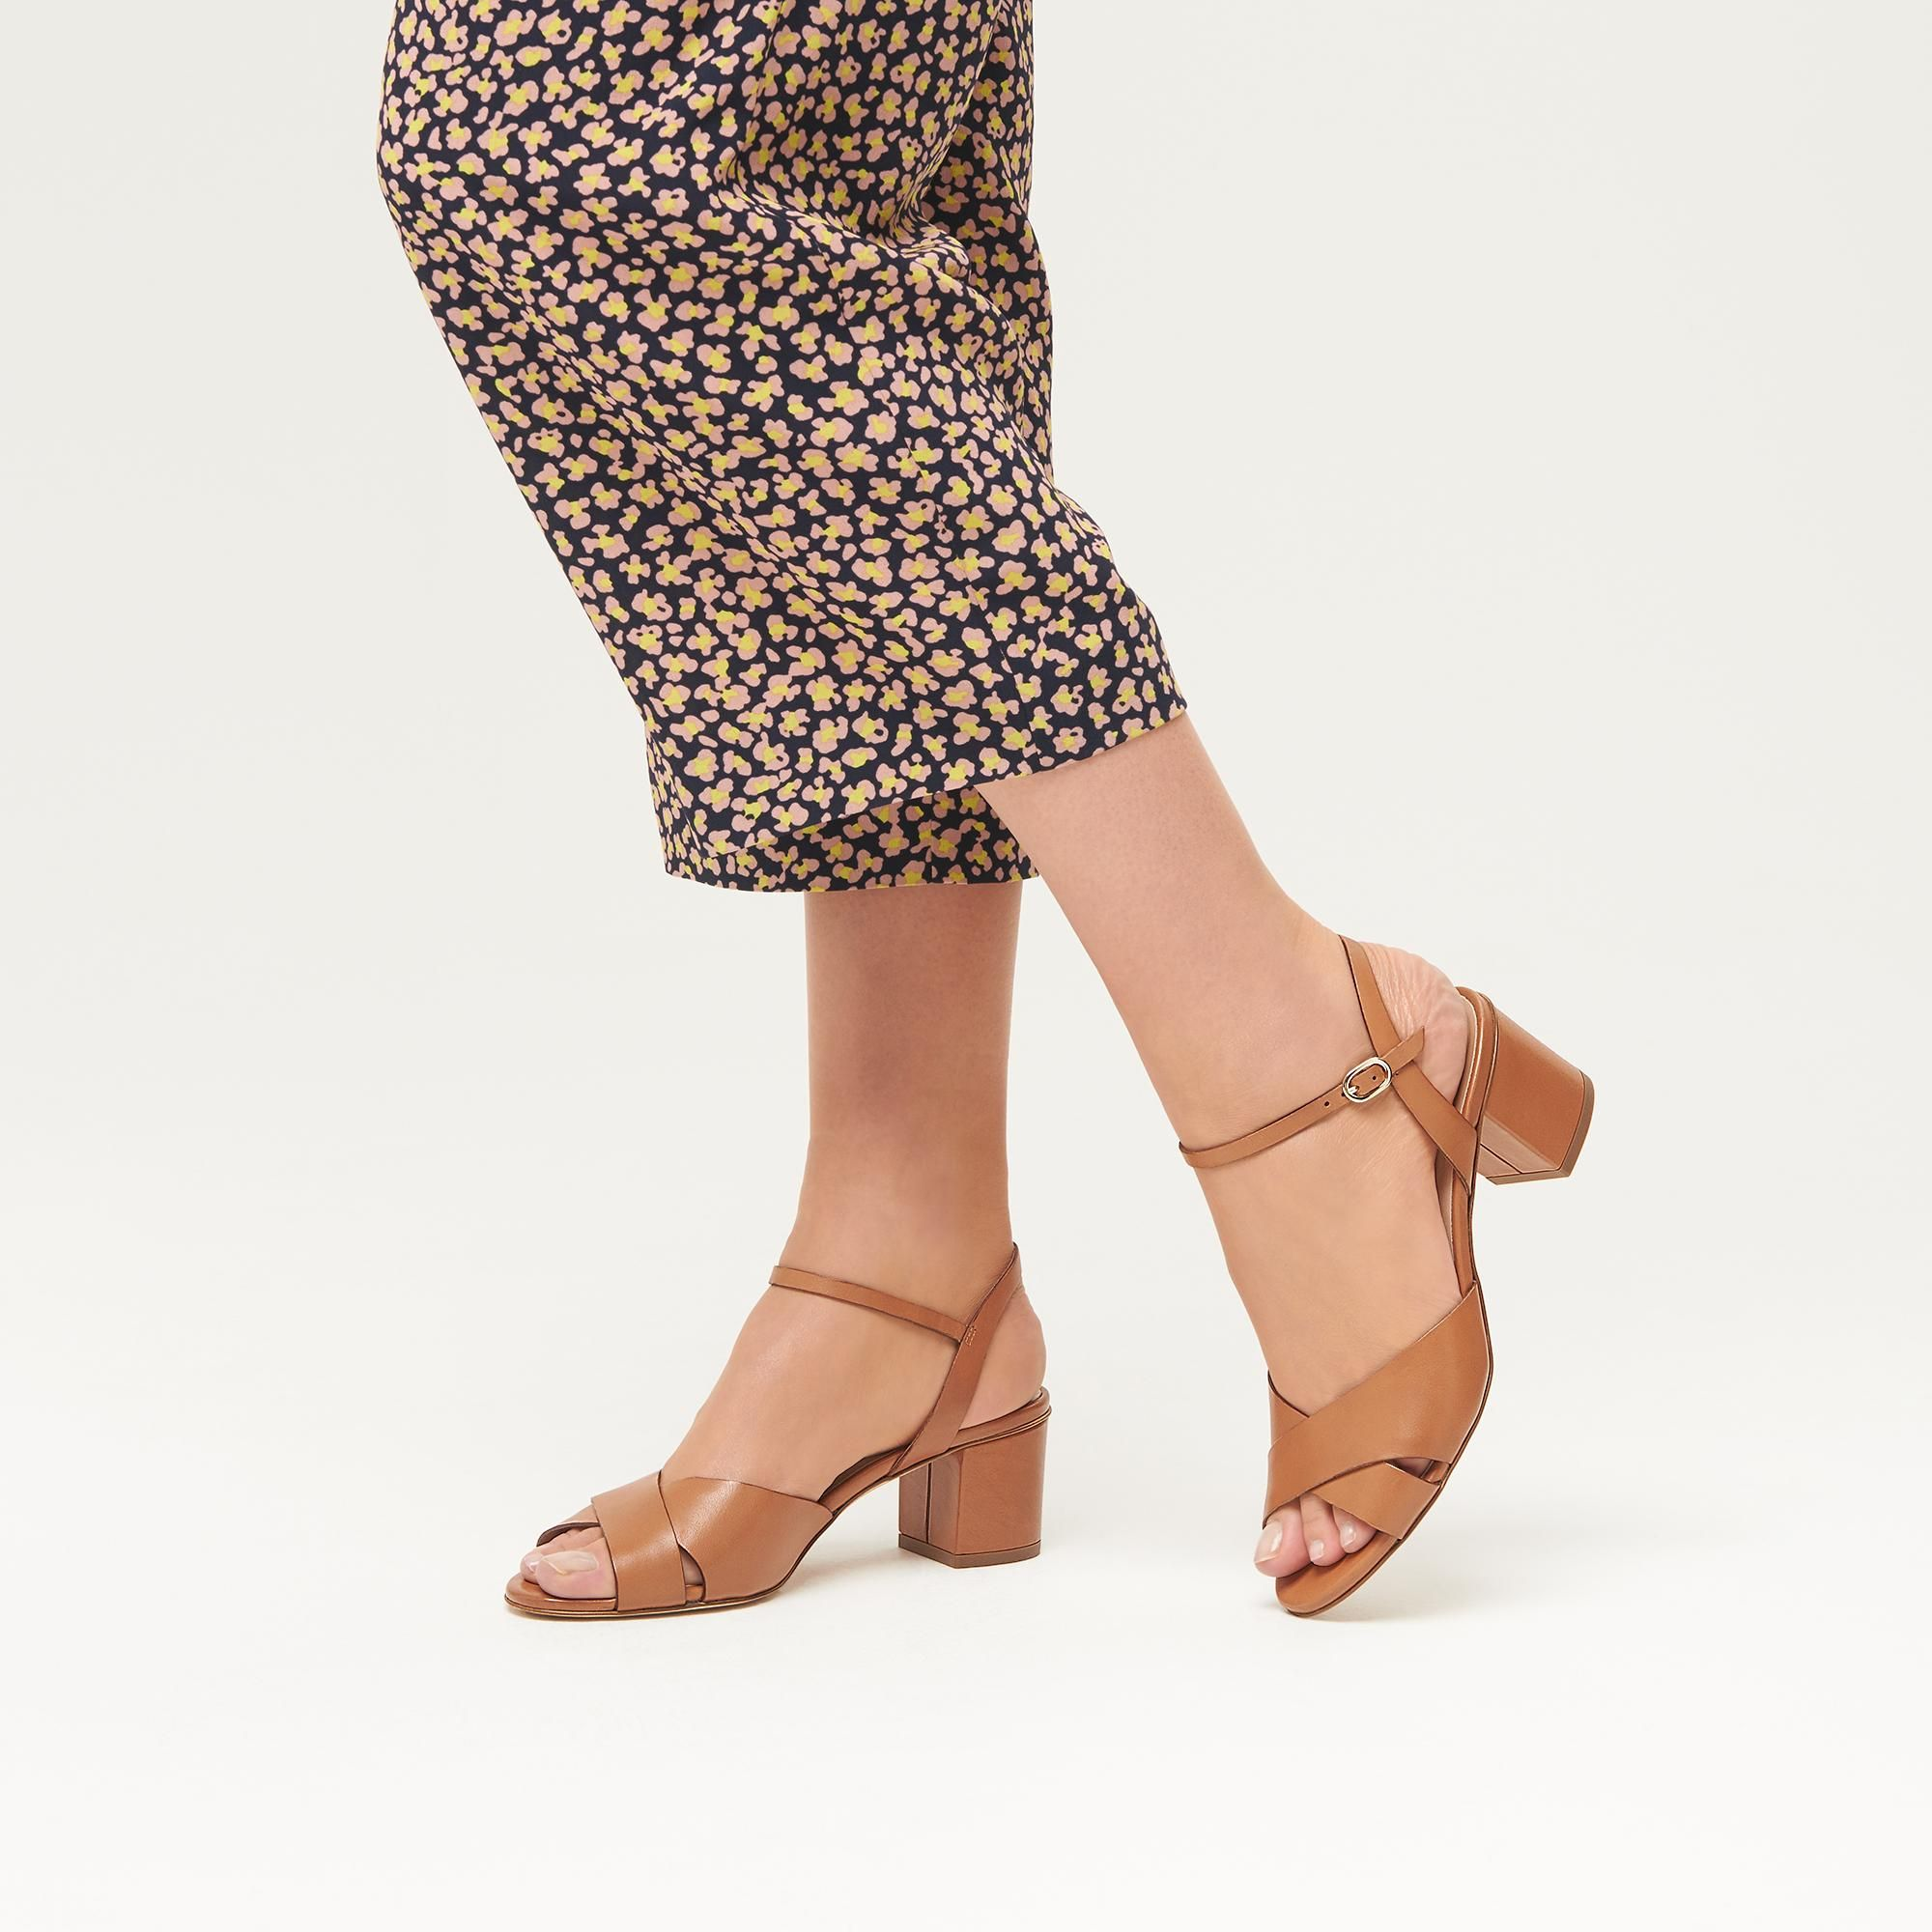 Londony /♥‿/♥ Womens Cross Ankle Open Toe High Chunky Block Heel Pump Dress Sandals